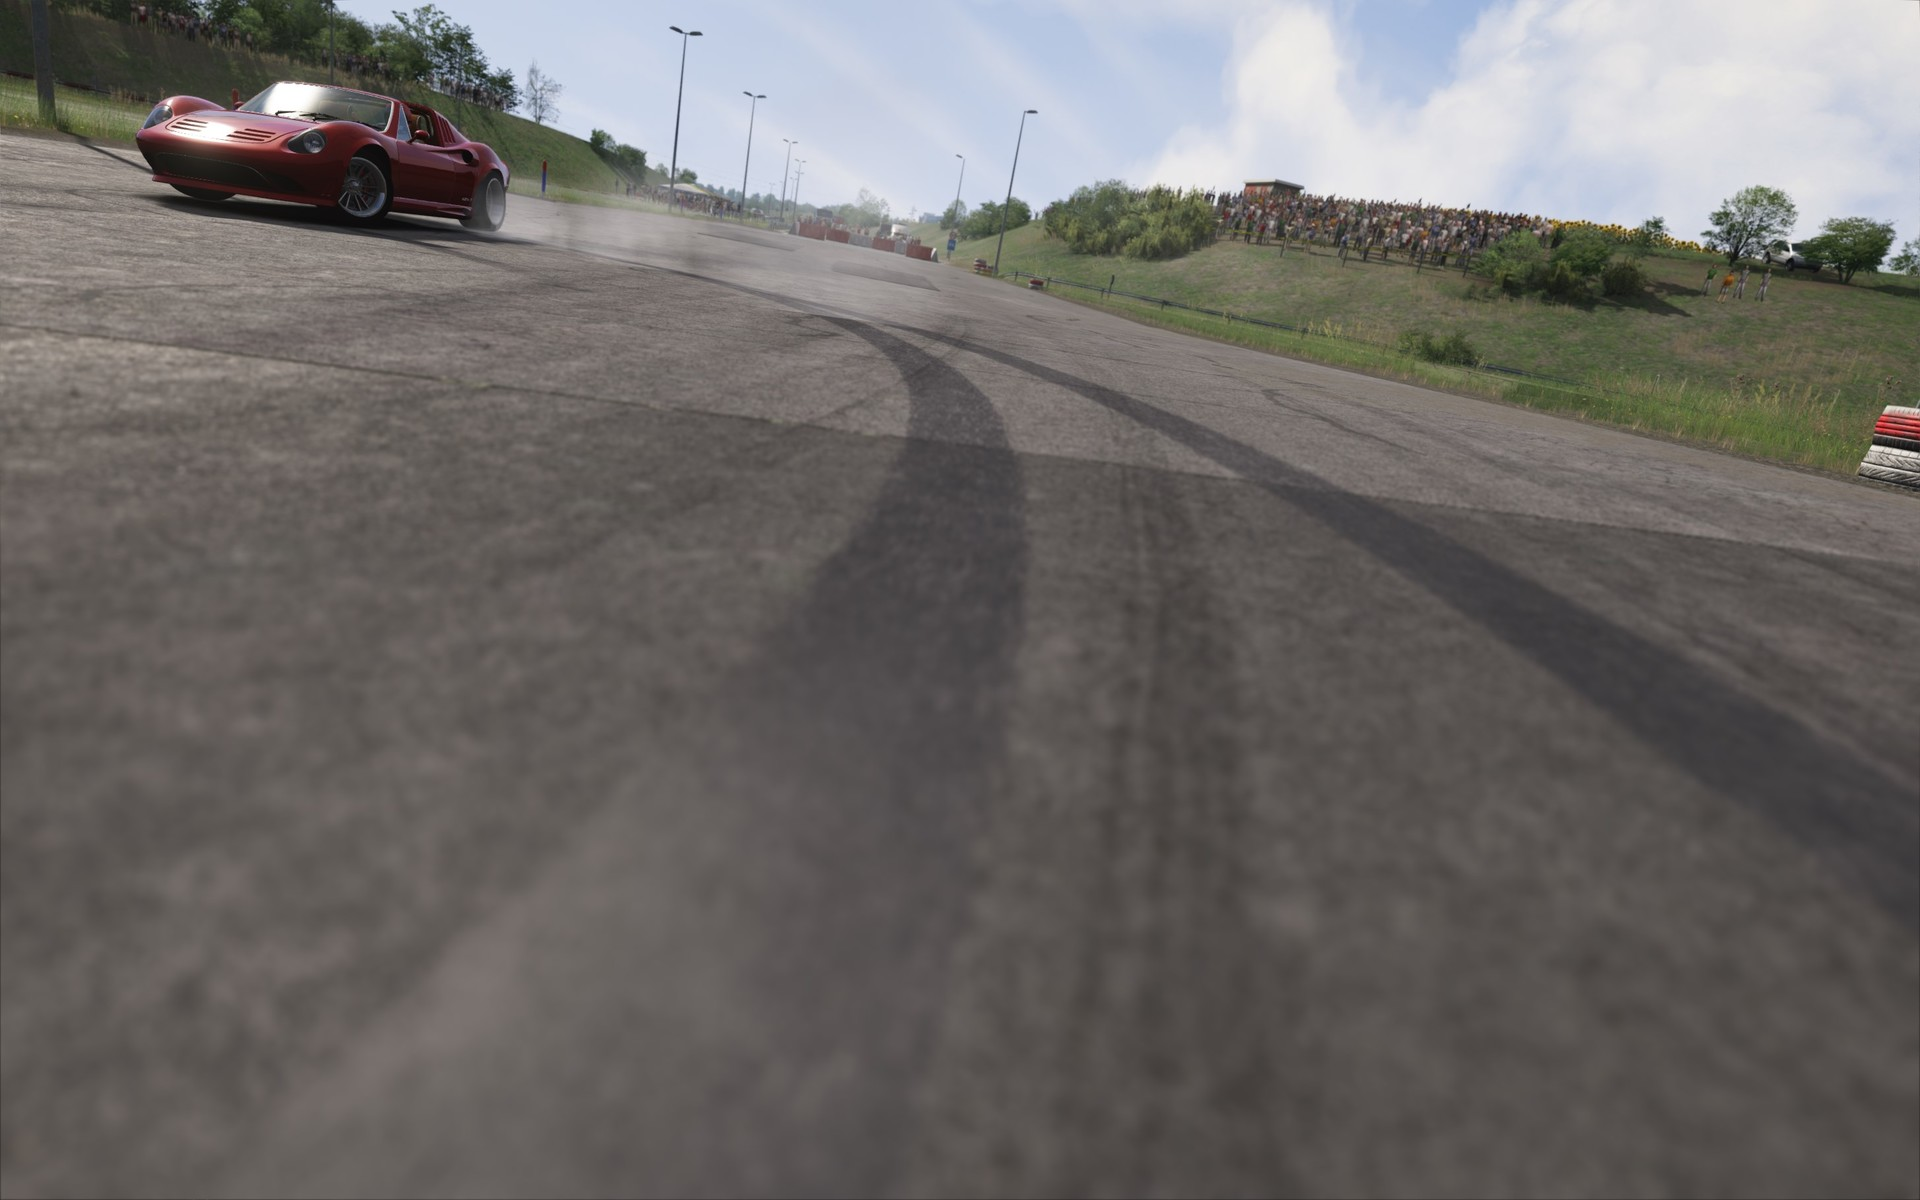 Daniel russo screenshot a3dr veloce gts miseluk 13 3 117 16 41 44